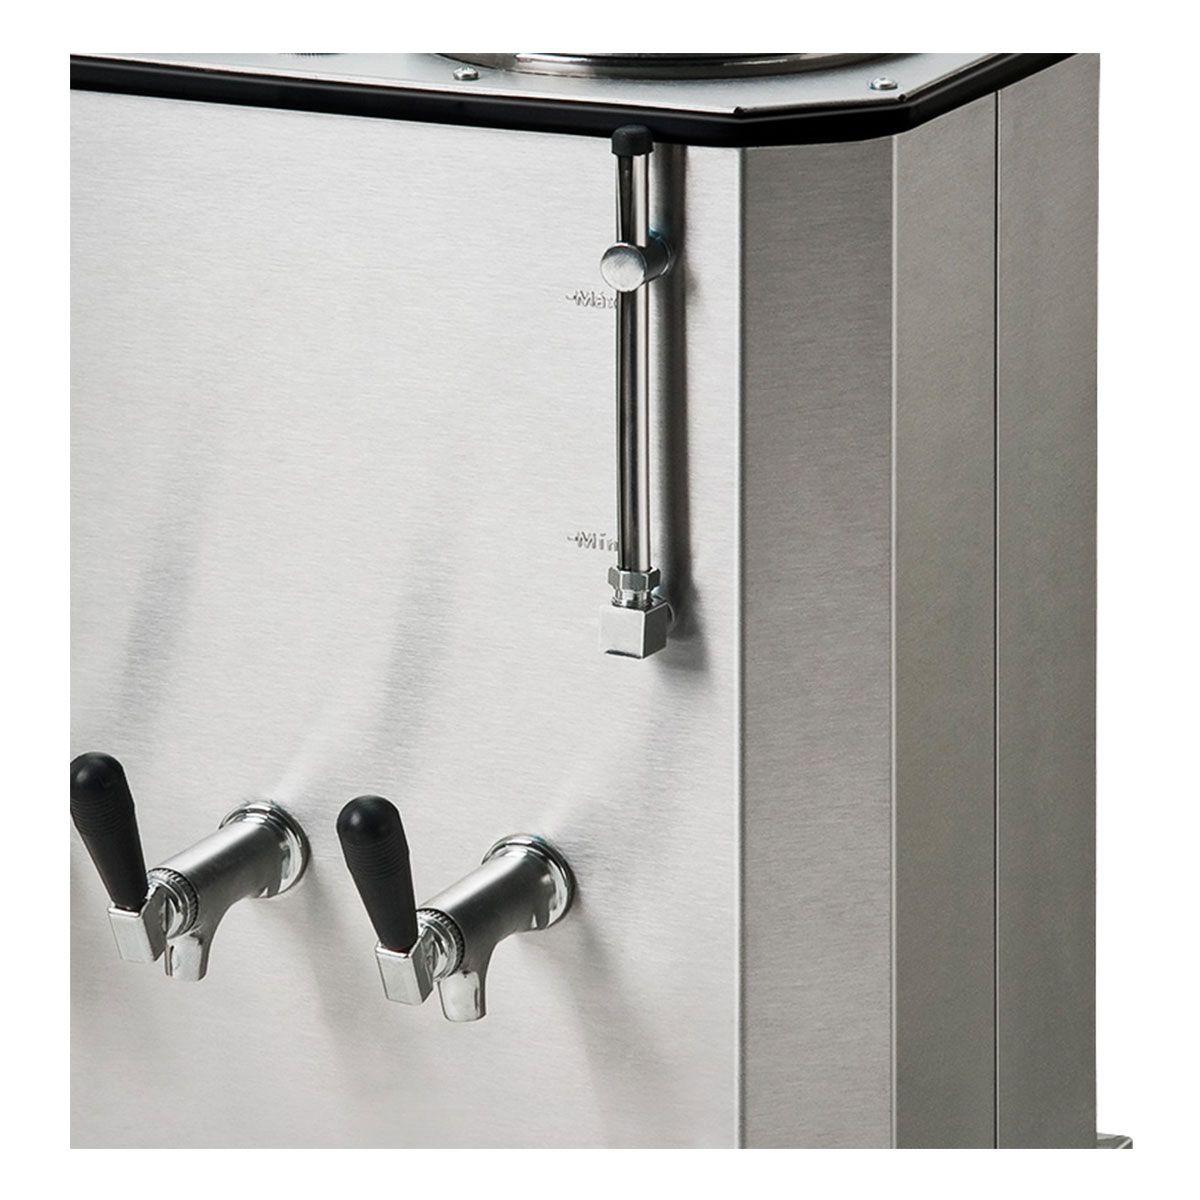 Cafeteira Elétrica Industrial 50 Litros 6300W Inox - Marchesoni - 220V